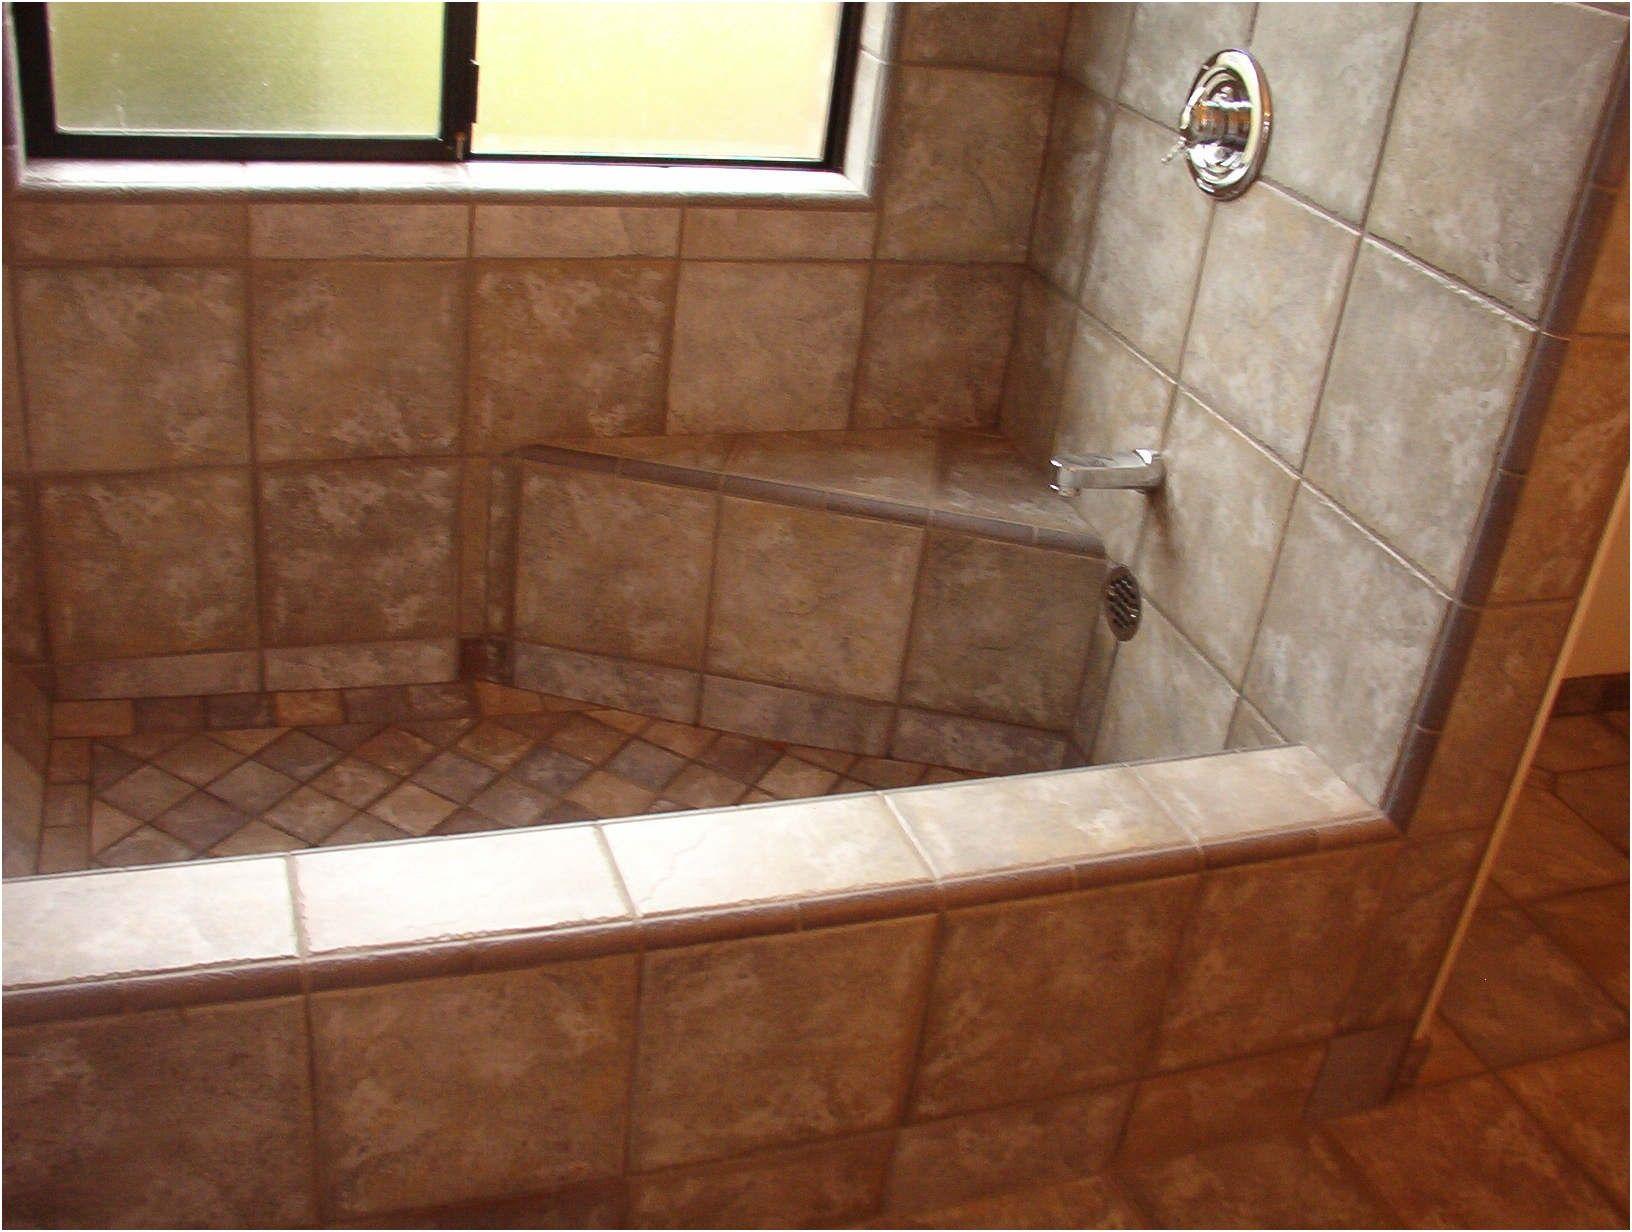 Genial Roman Bathtub Ideas Bathtub Ideas From Roman Bathroom Tiles